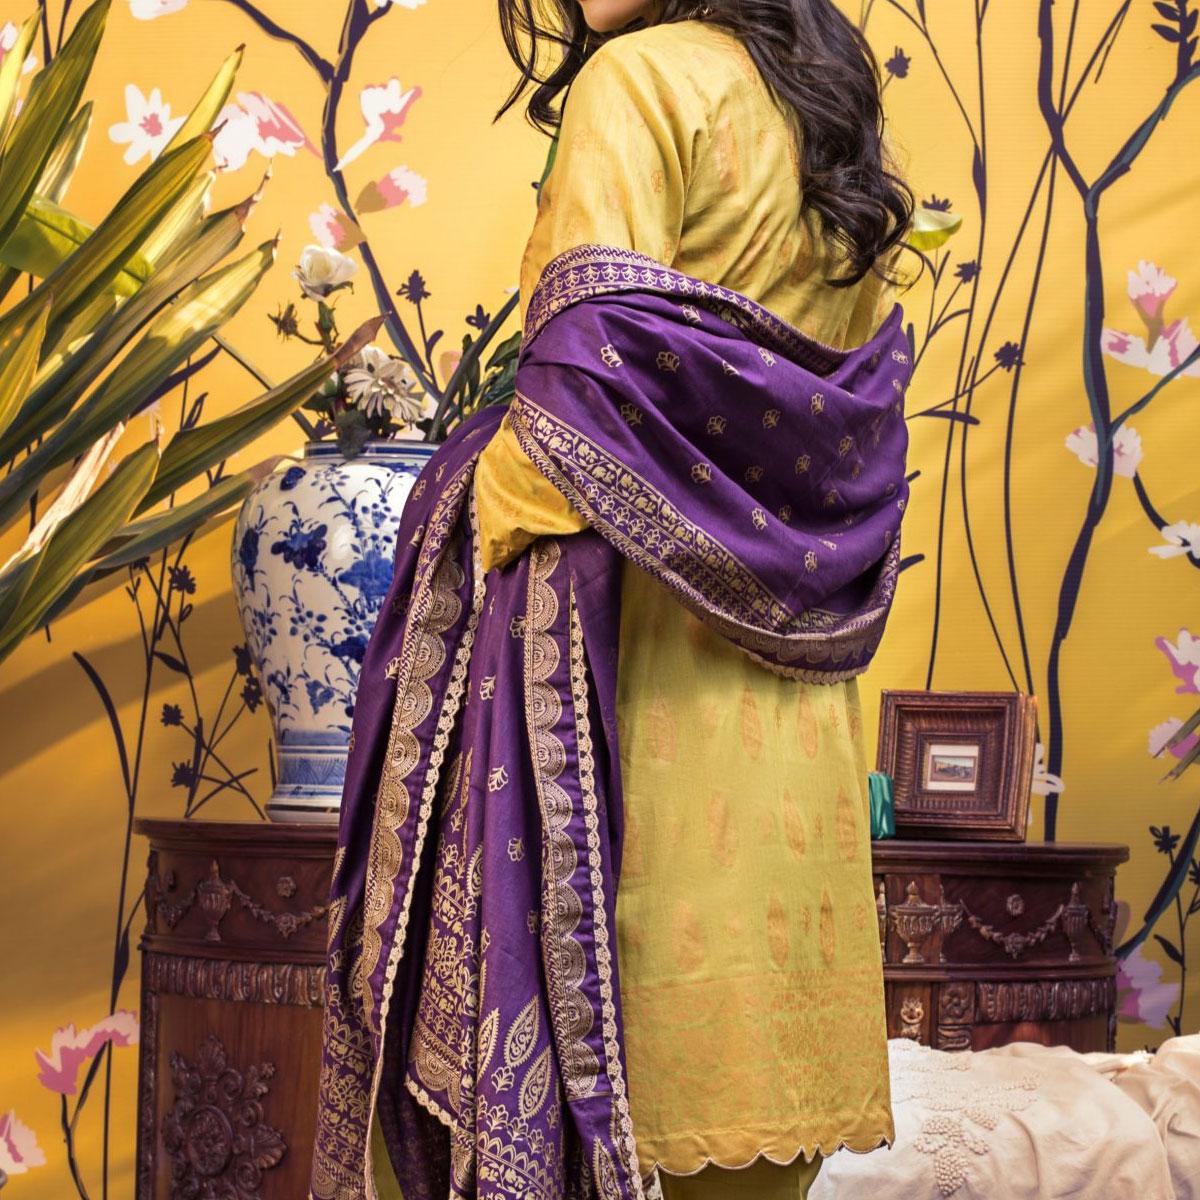 Banarsi Lawn Printed Collection 3 Pec Suit BY Z.S Textile (RBP-03) (Unstitched) Gallery Image 1